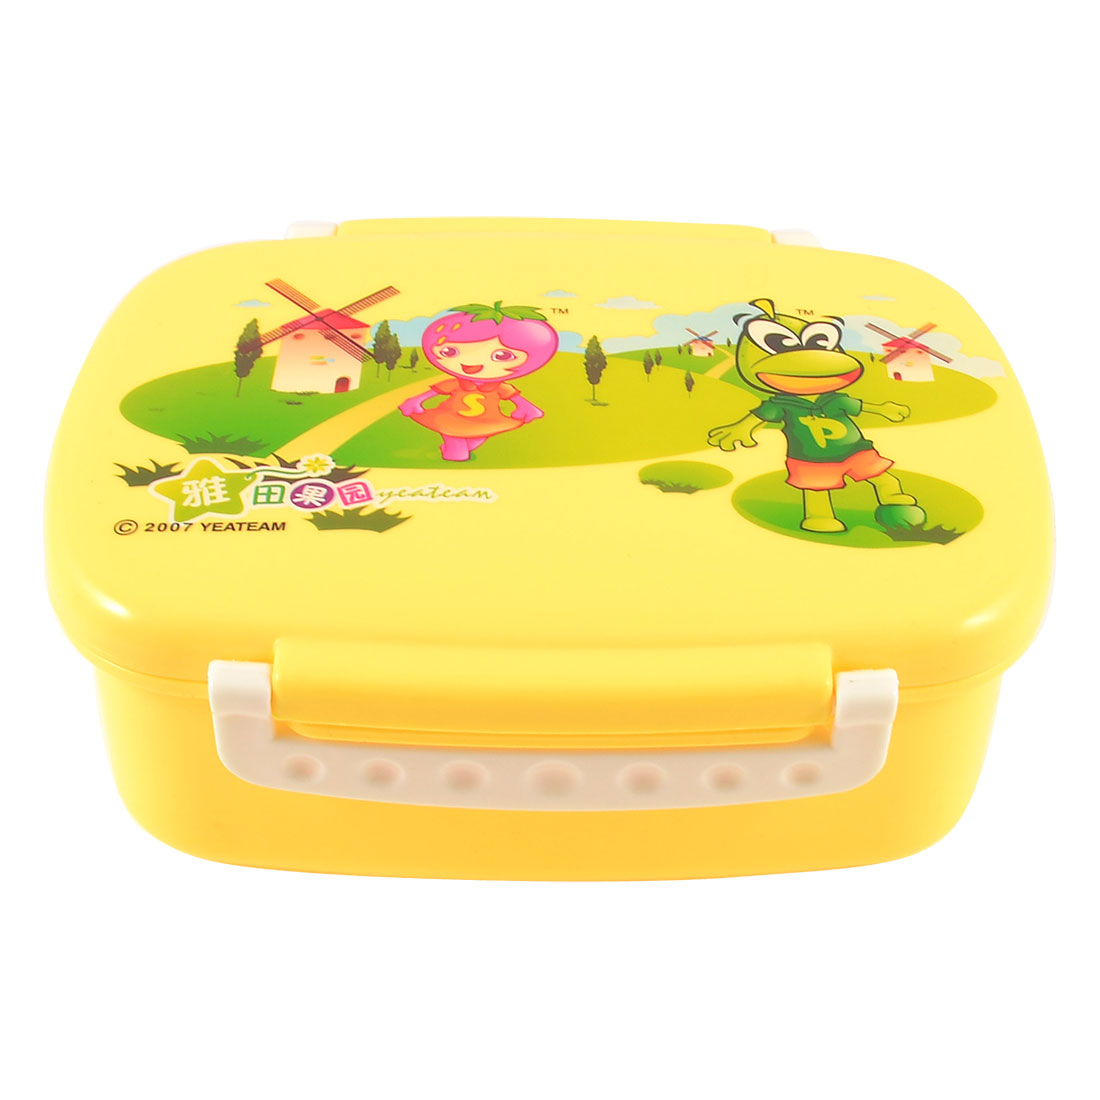 Travel Cartoon Print Orange Plastic Food Container Lunch Box Case w Spoon